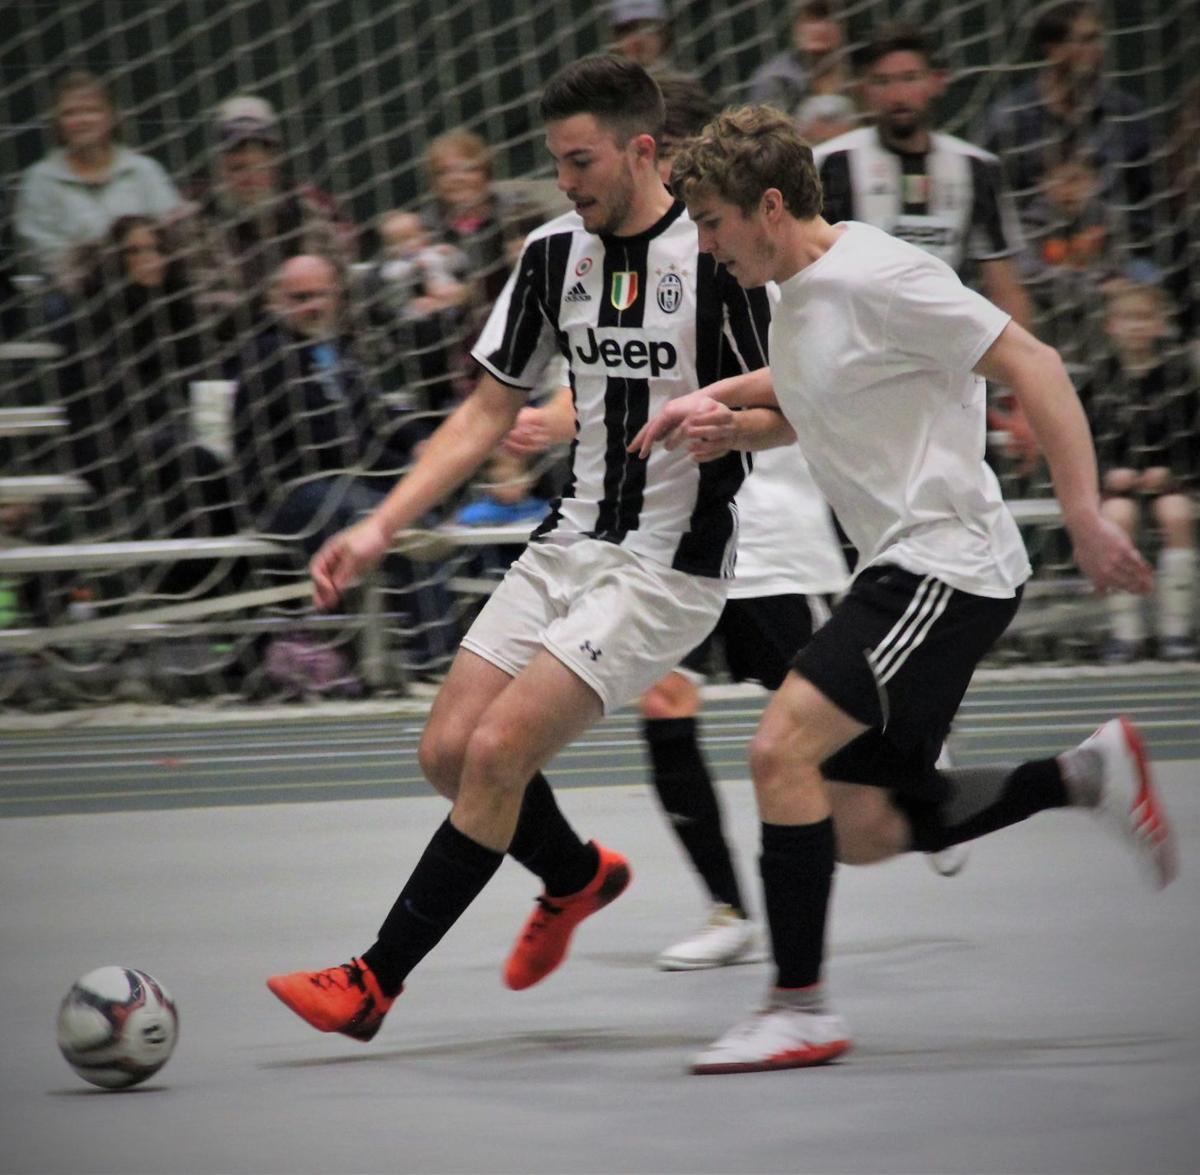 020719-nh-soccer002.JPG